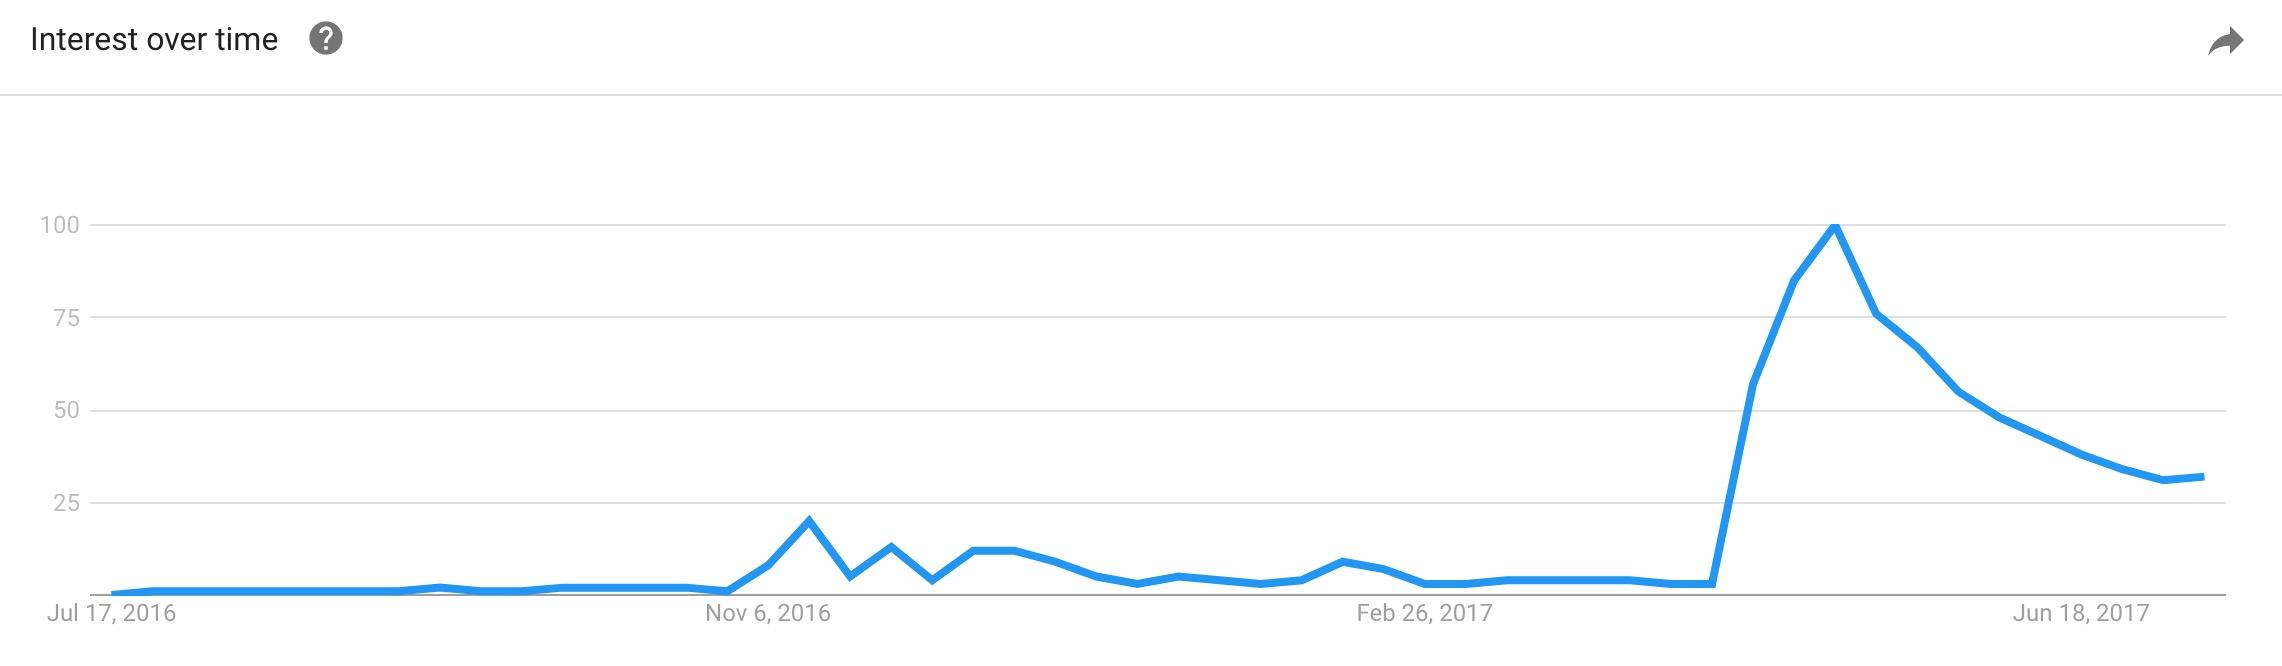 Logic 1-800-273-8255 Google Trends